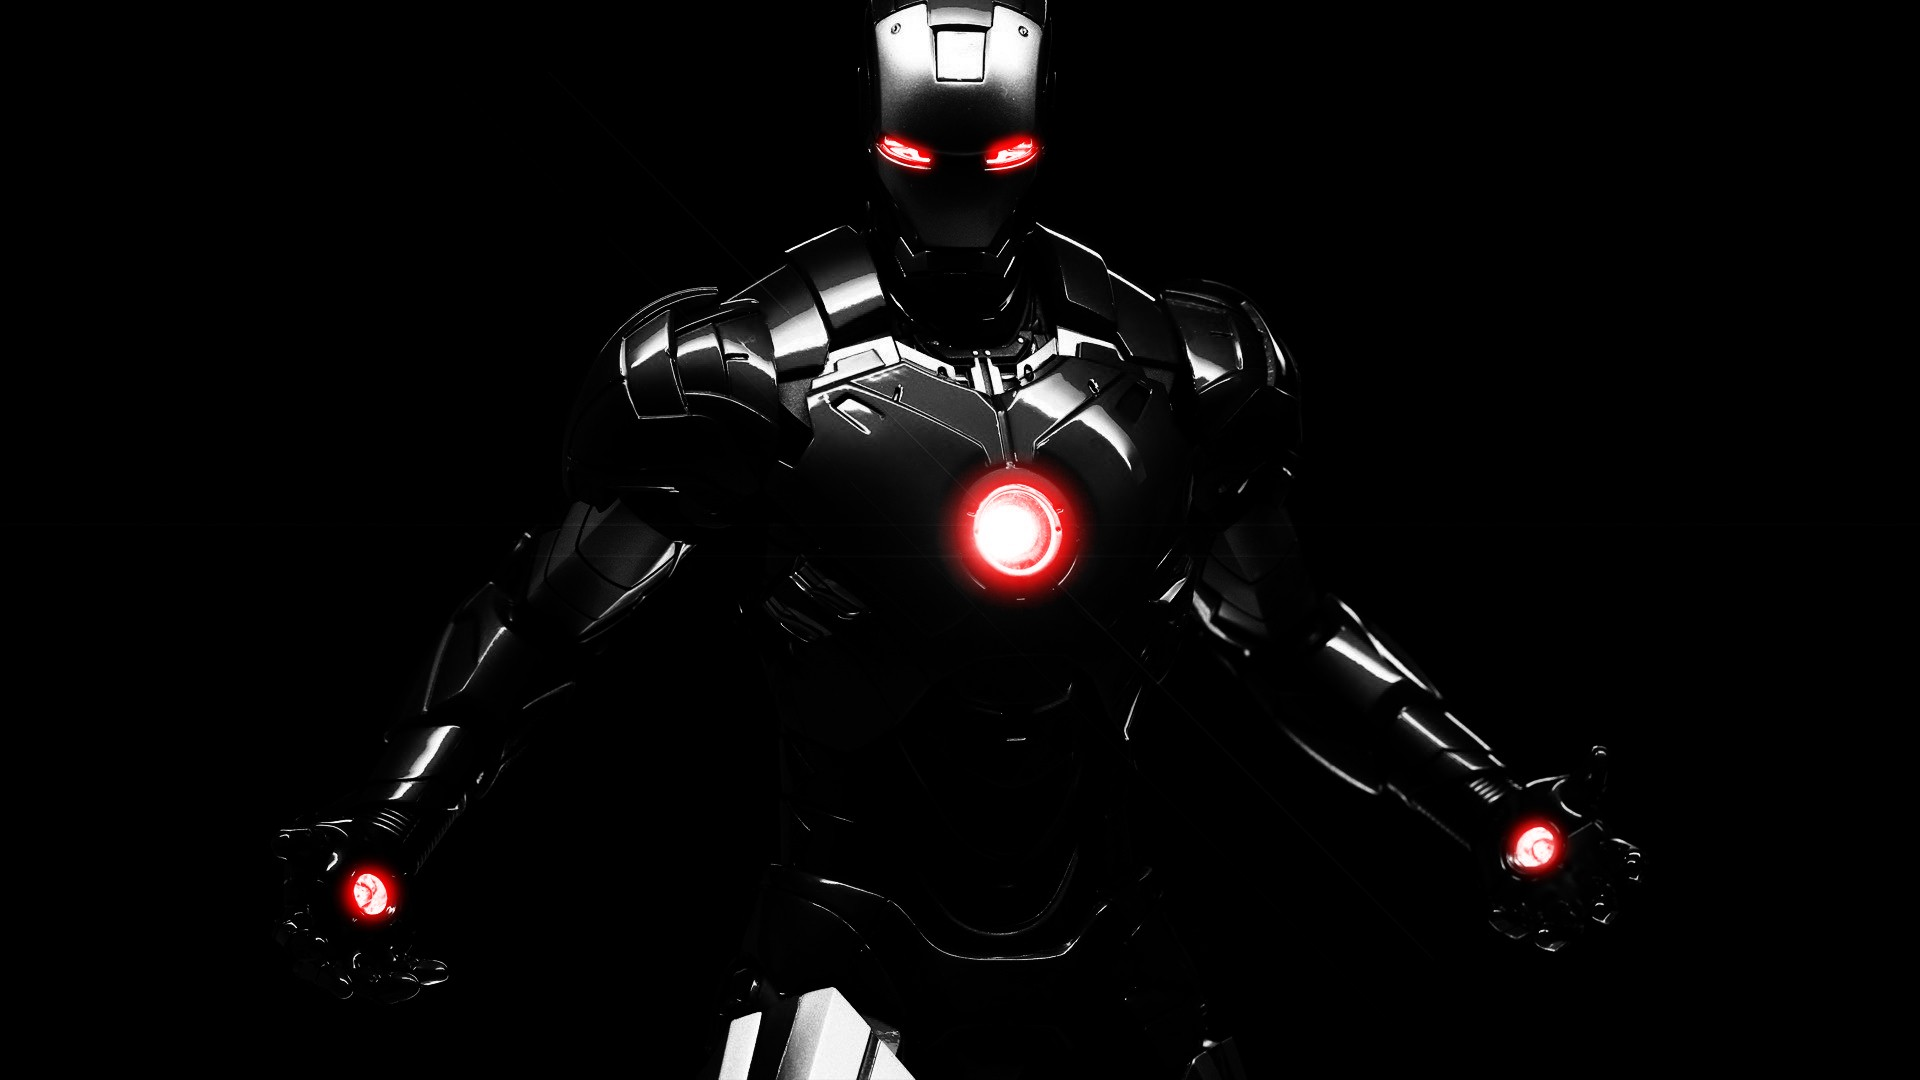 iron man wallpaper hd 8955 1920x1080px